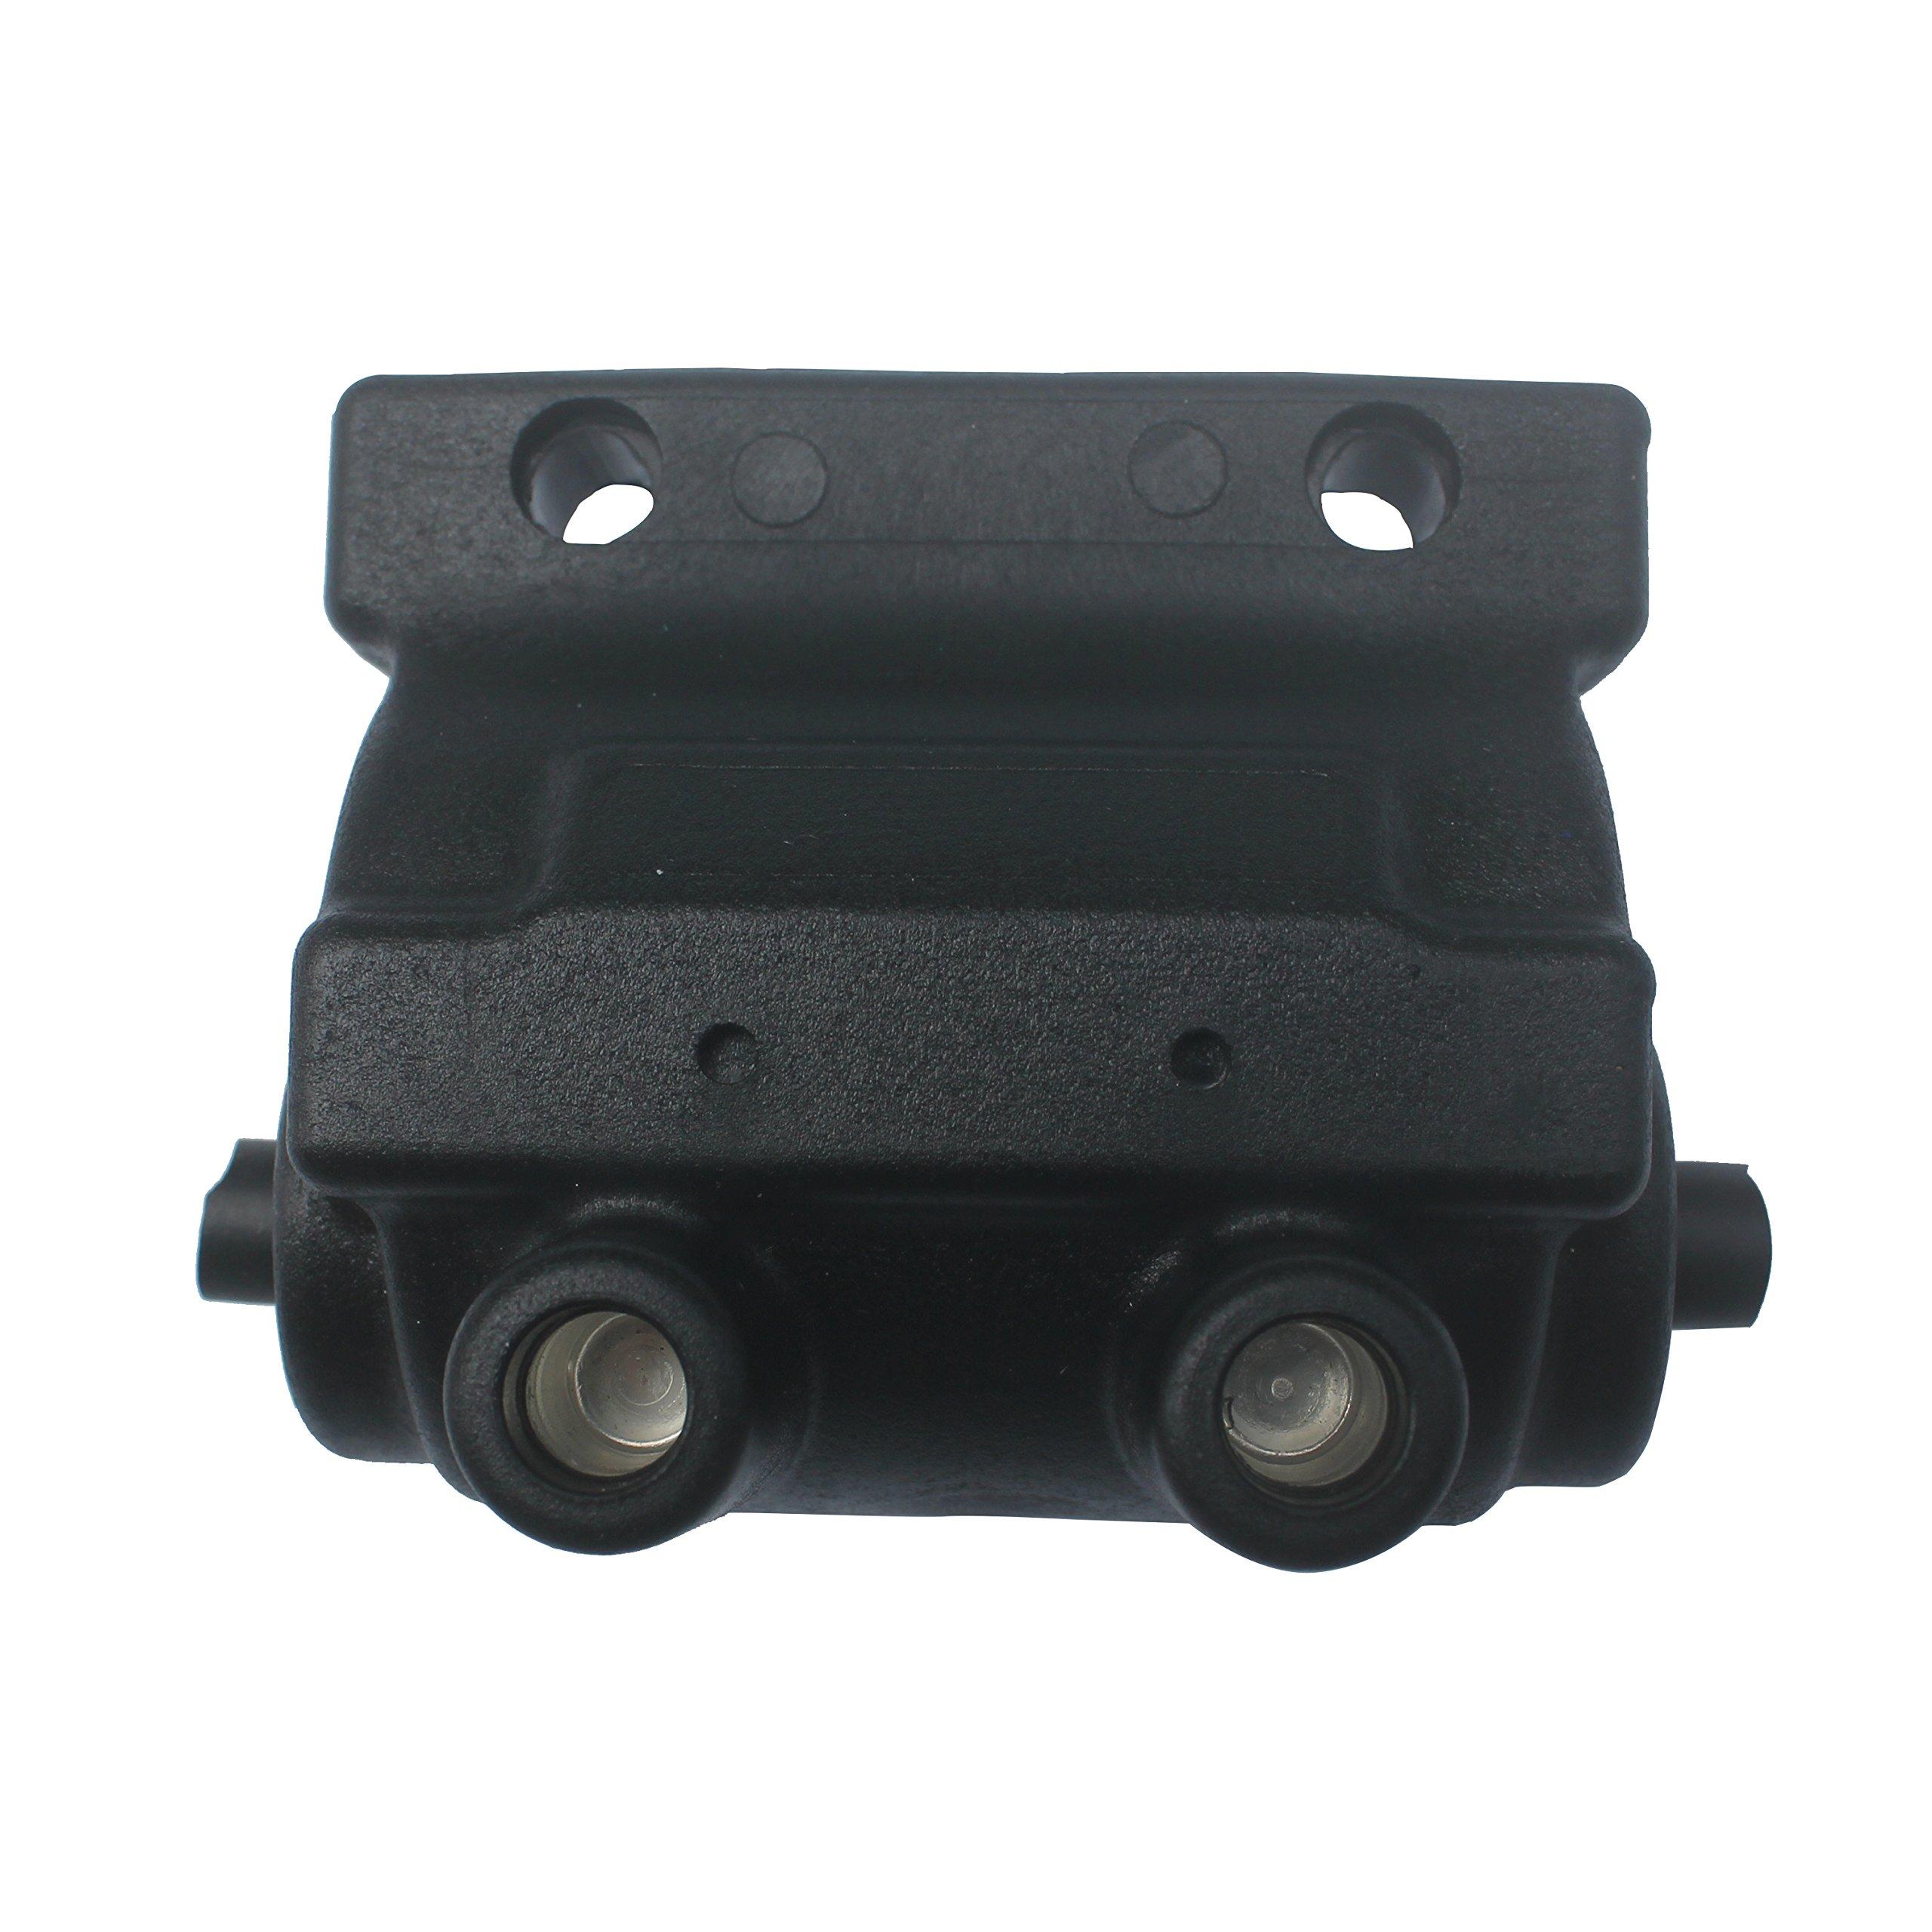 KIPA Ignition Coil for Kohler K482 K532 K482S K582 K662 KT17 KT19 Engines Wheel Horse D-200 D-180 Tractor Lawnmower Generator Replace OEM # 277375 277375S 271688 271871